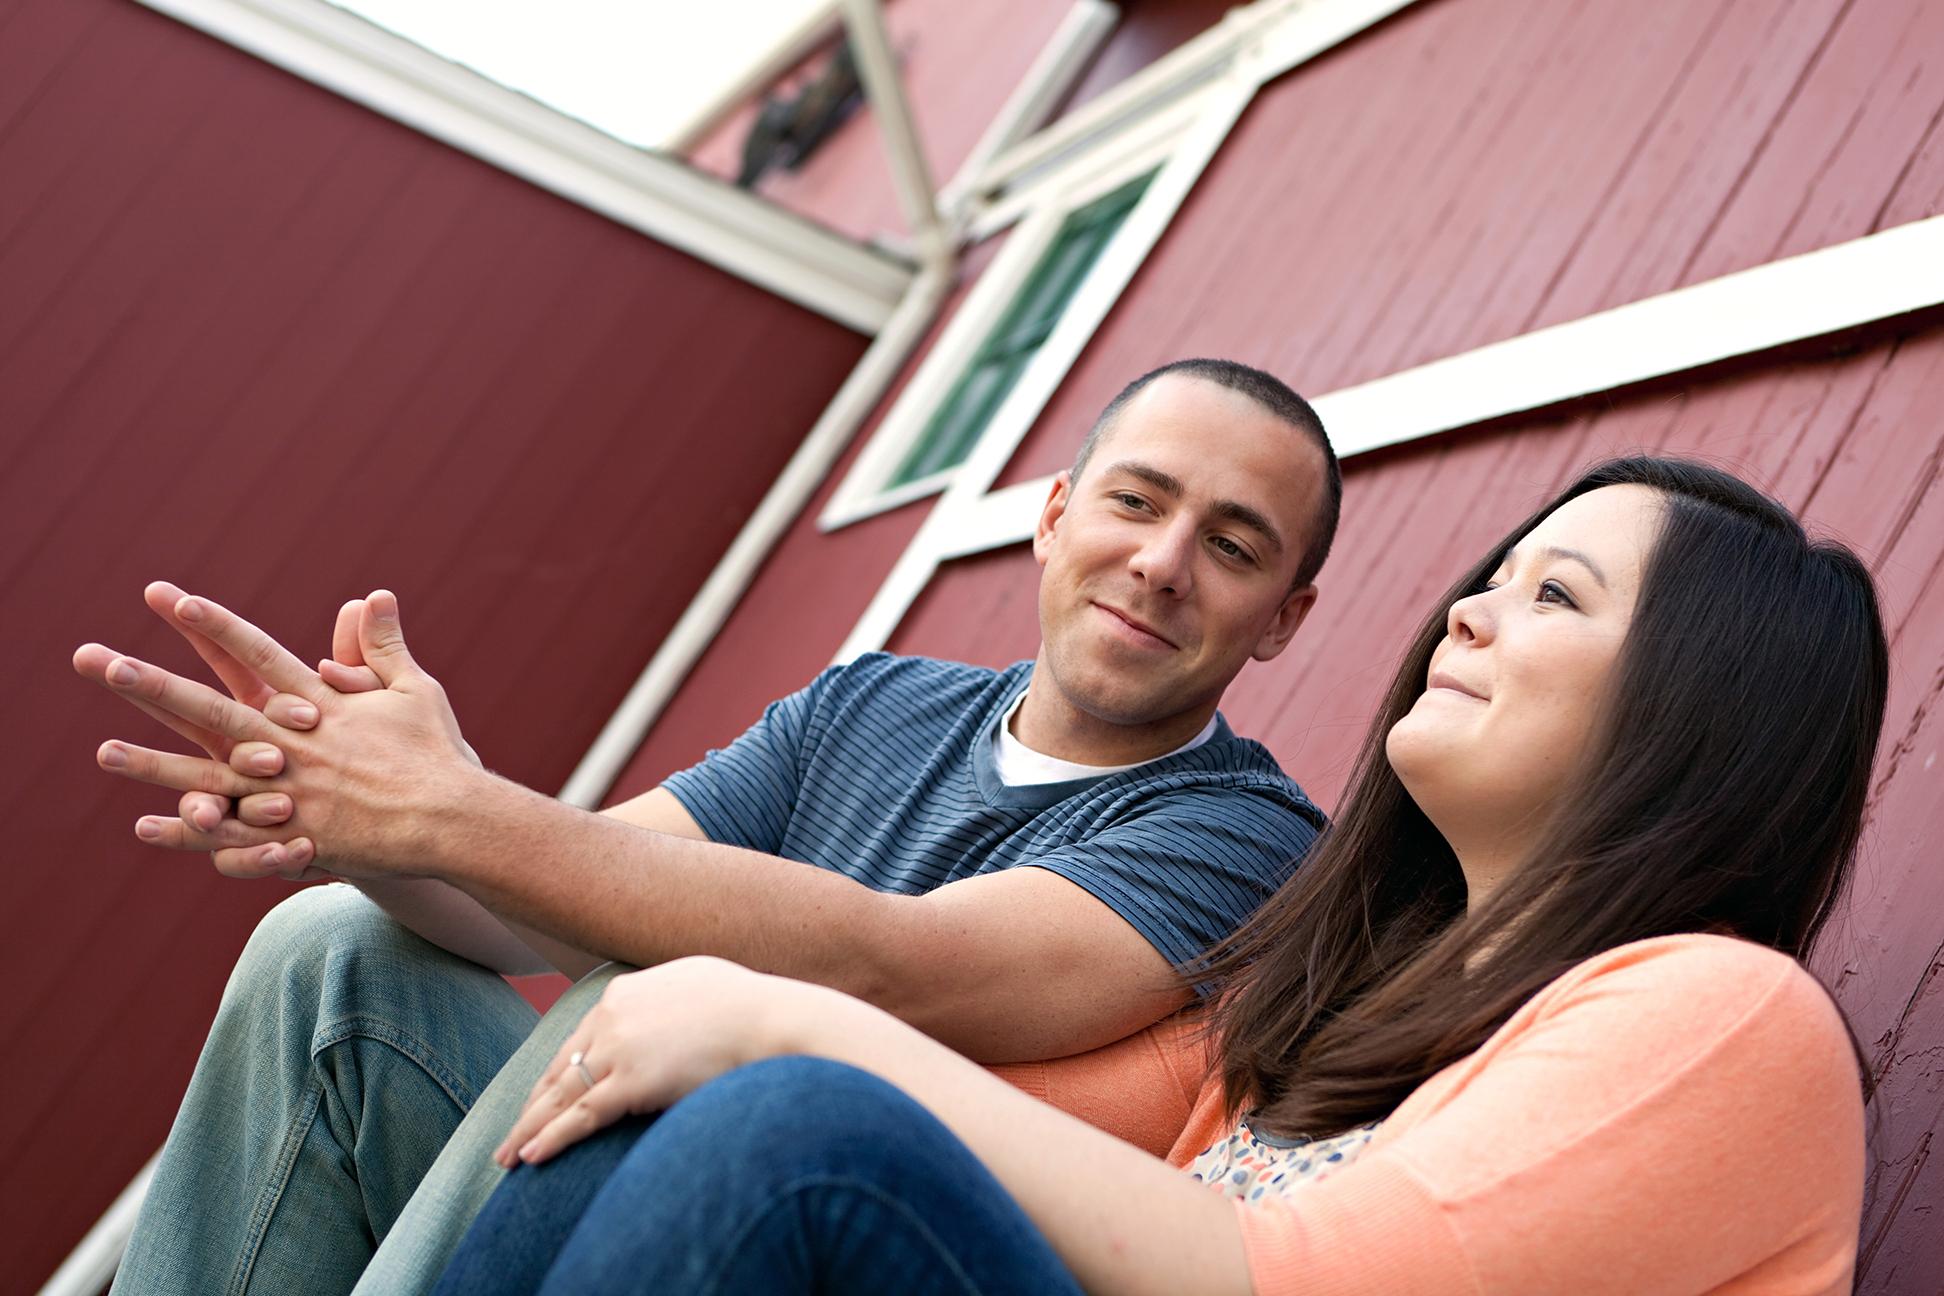 young-happy-couple-enjoying-each-others-company-outdoors_rF4N-9Rri.jpg